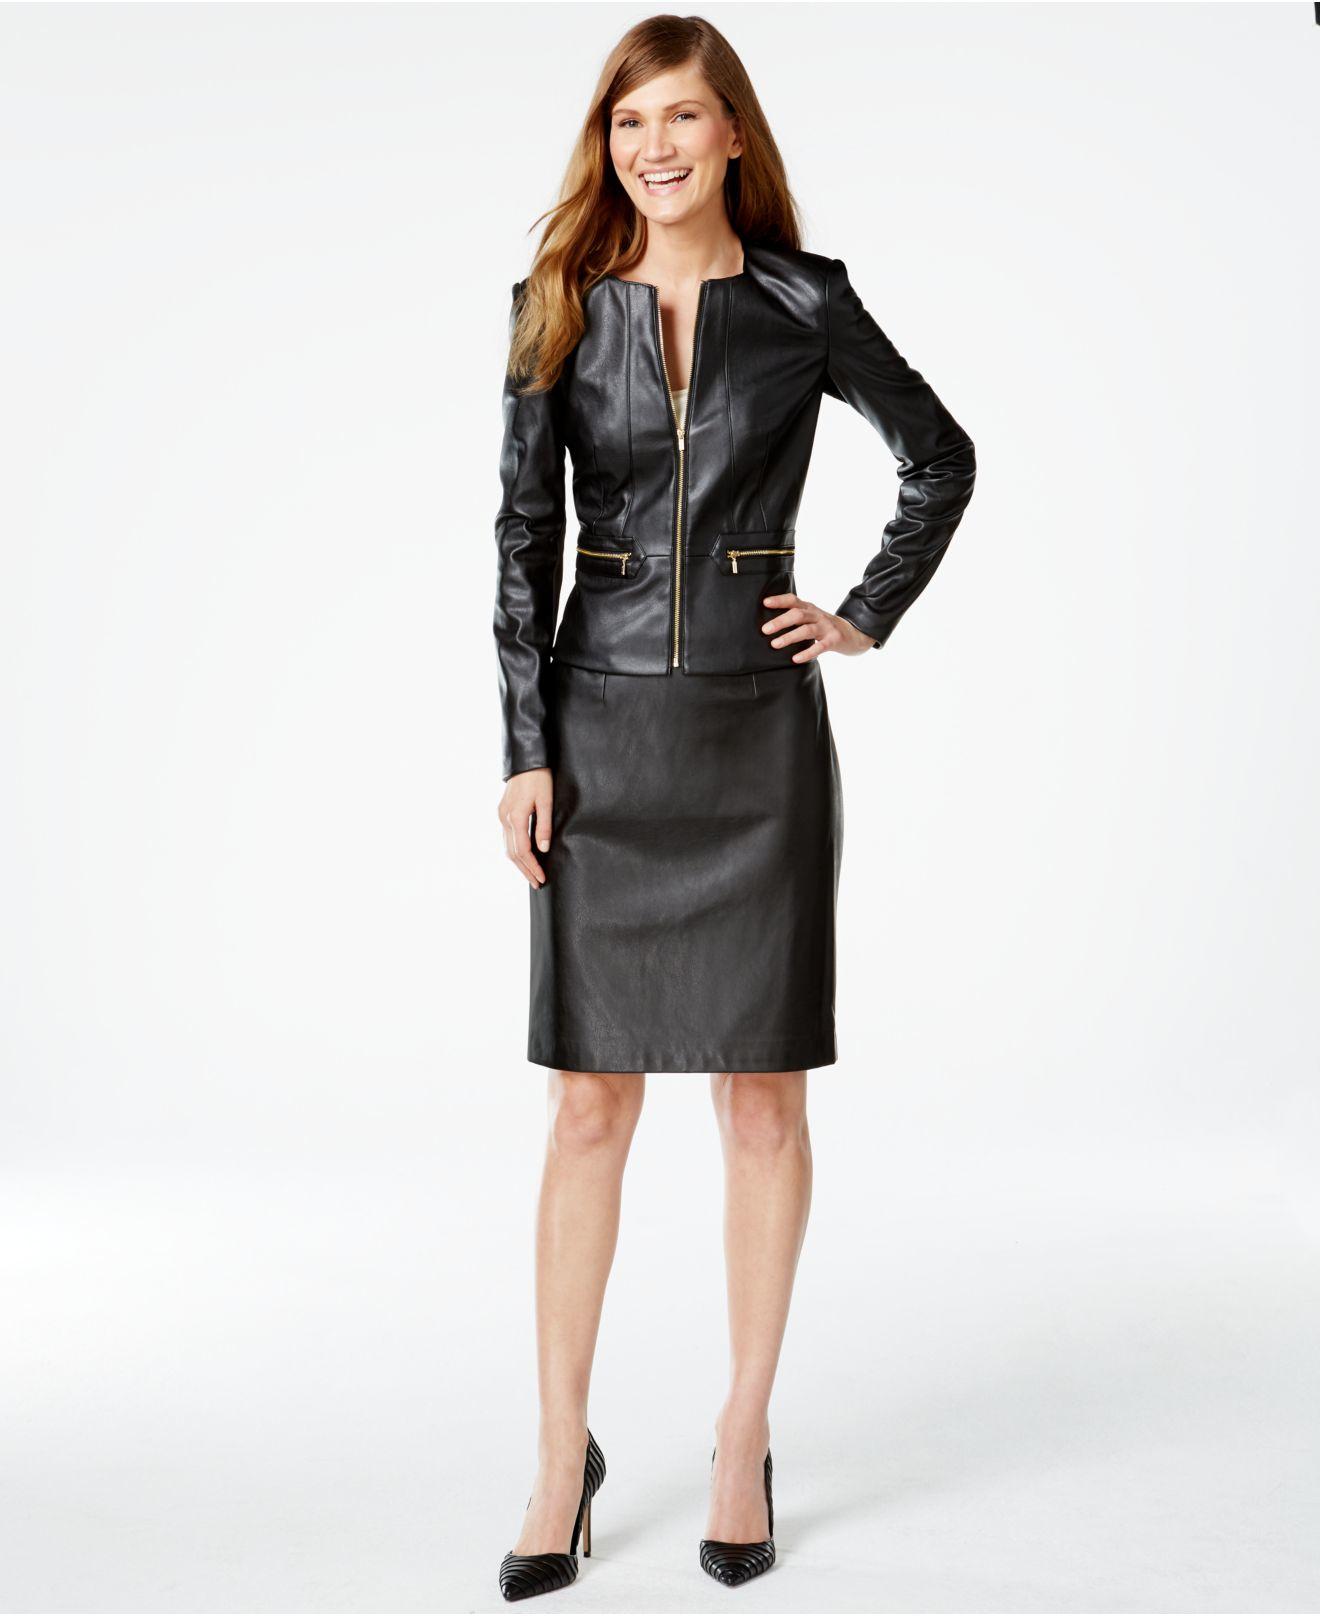 fe19cb511 Calvin Klein Black Faux-leather Zip-front Jacket